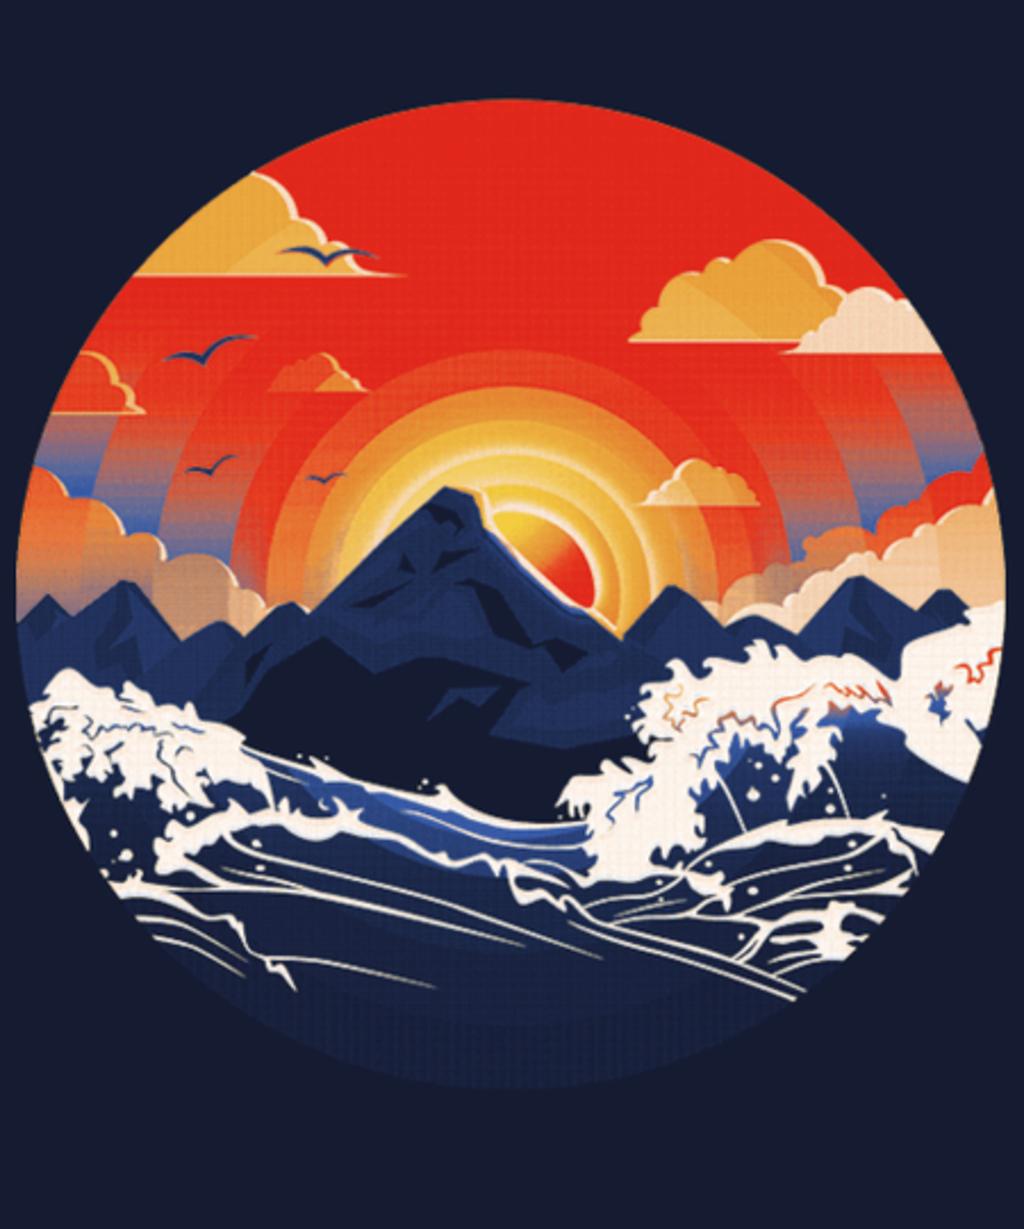 Qwertee: Over horizon